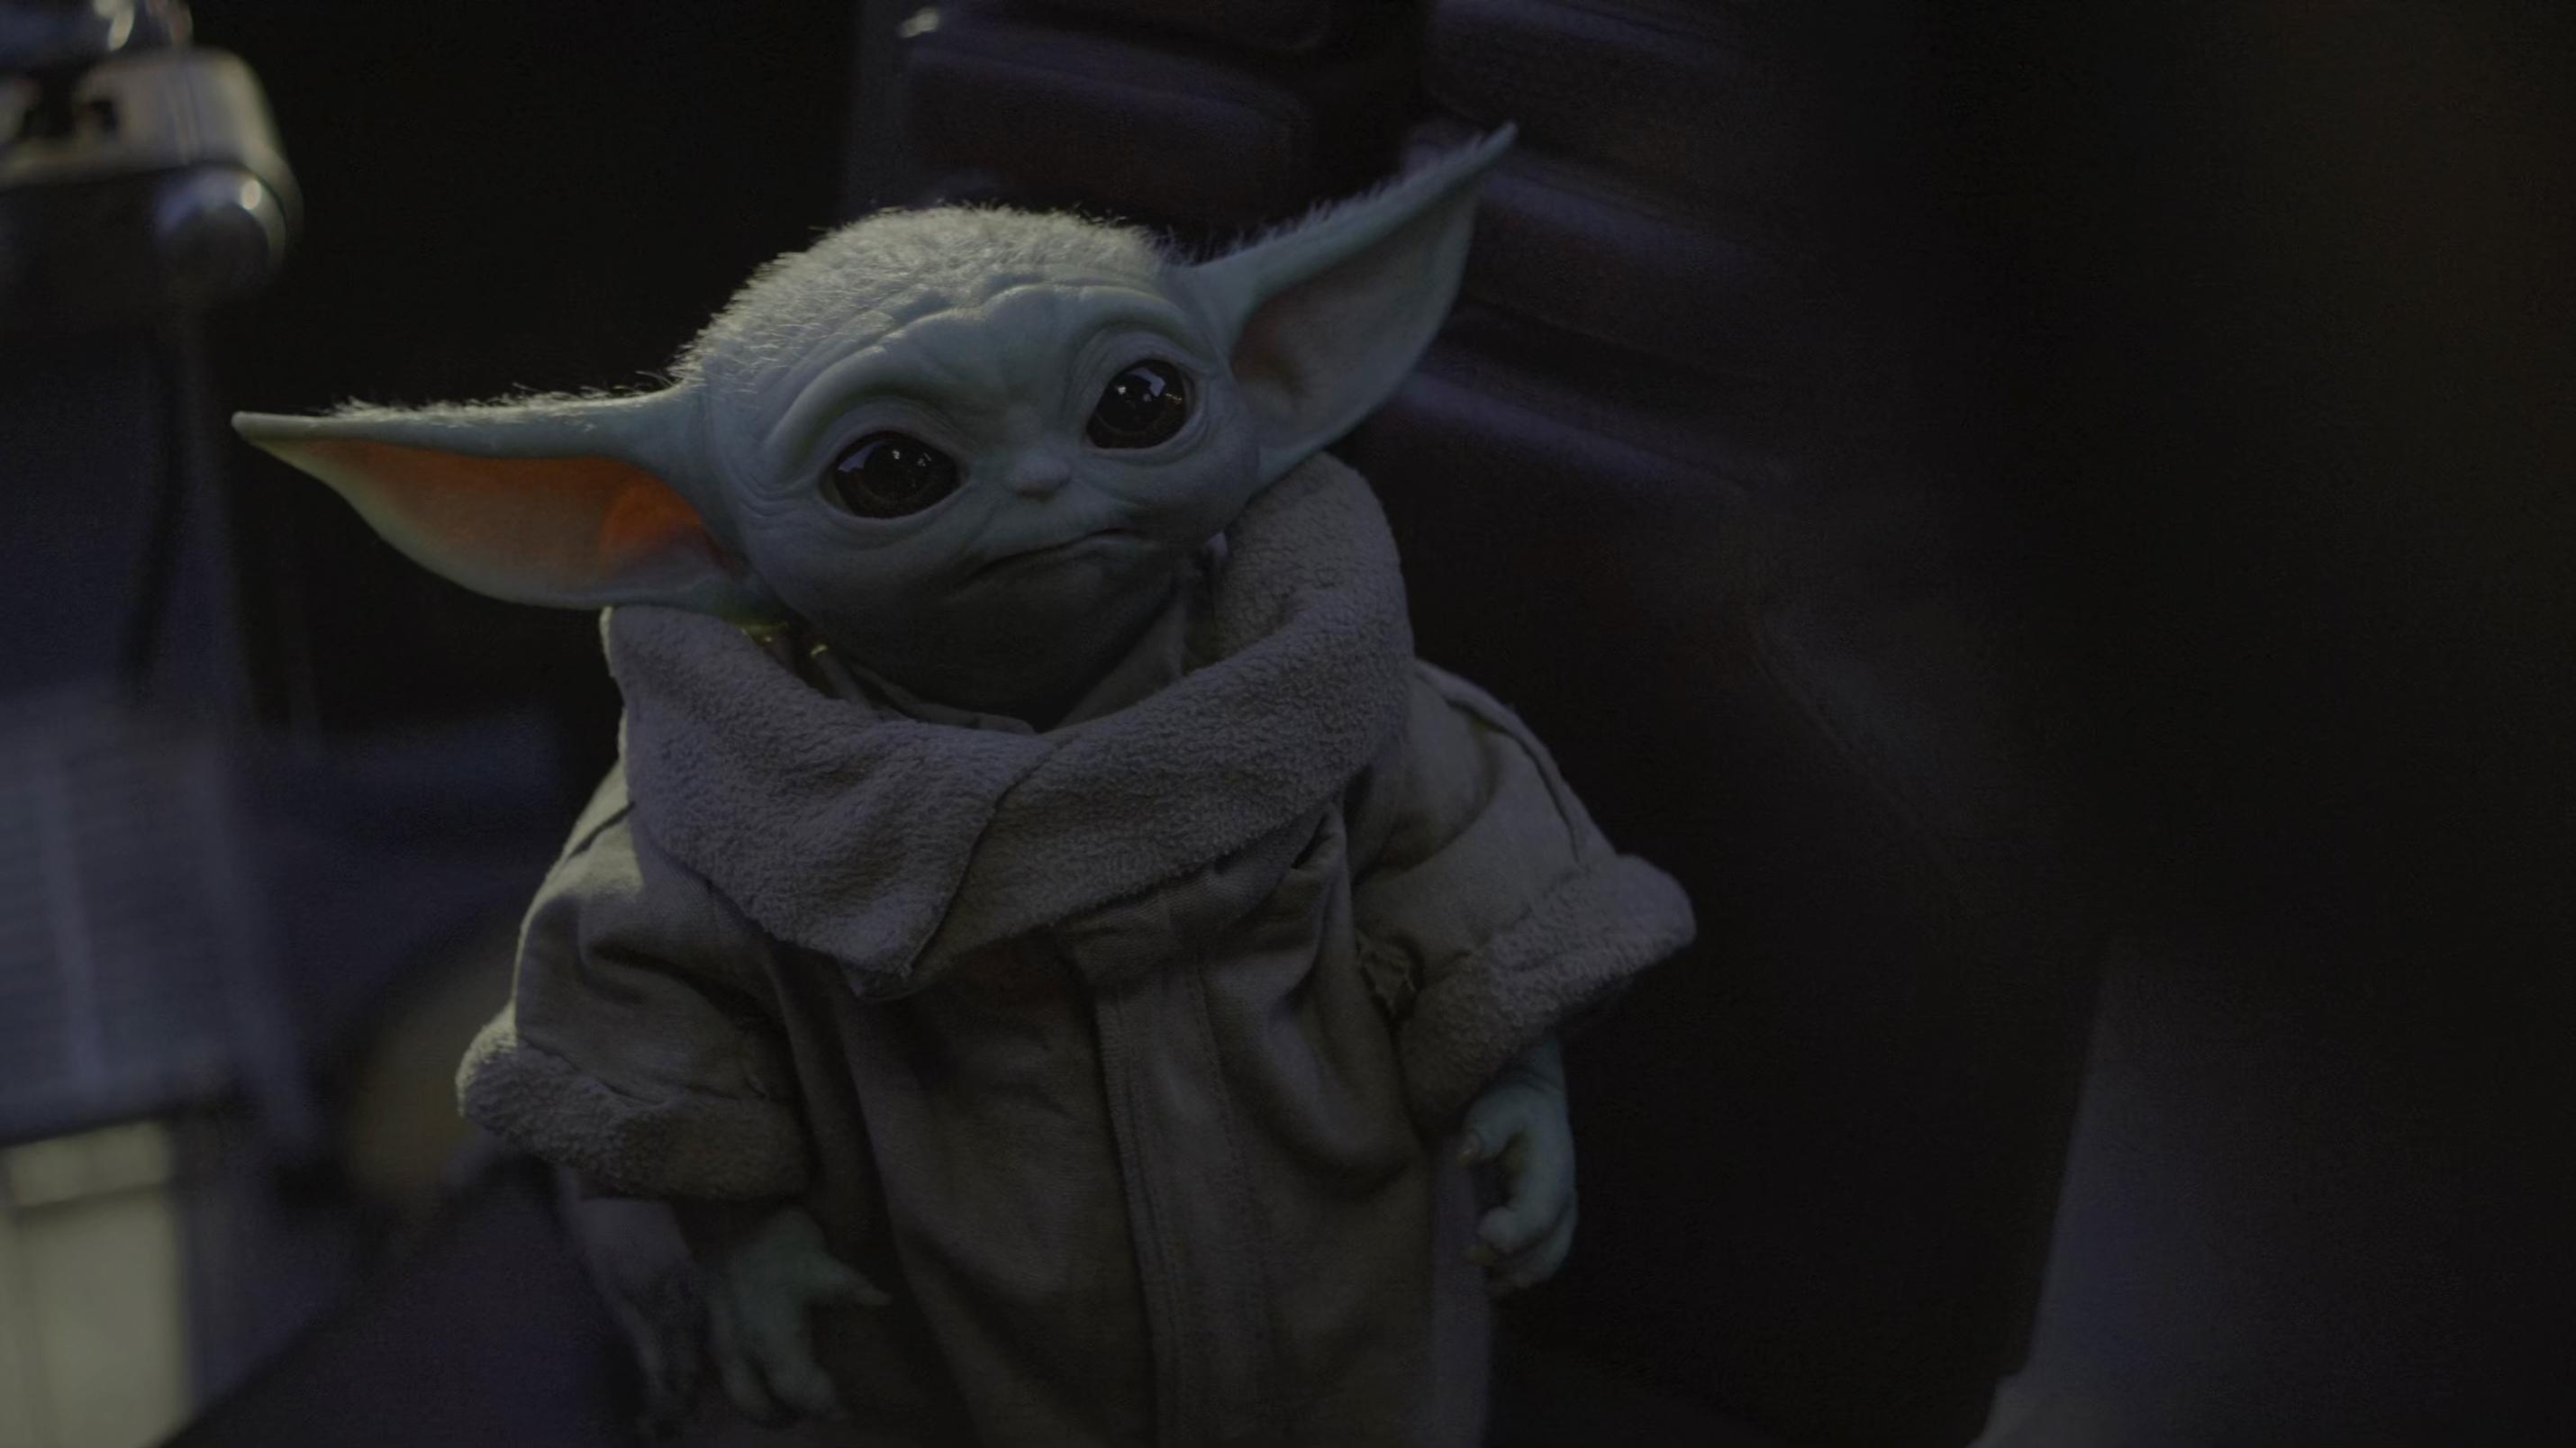 Wallpaper : The Mandalorian, Baby Yoda 2860x1608 ...